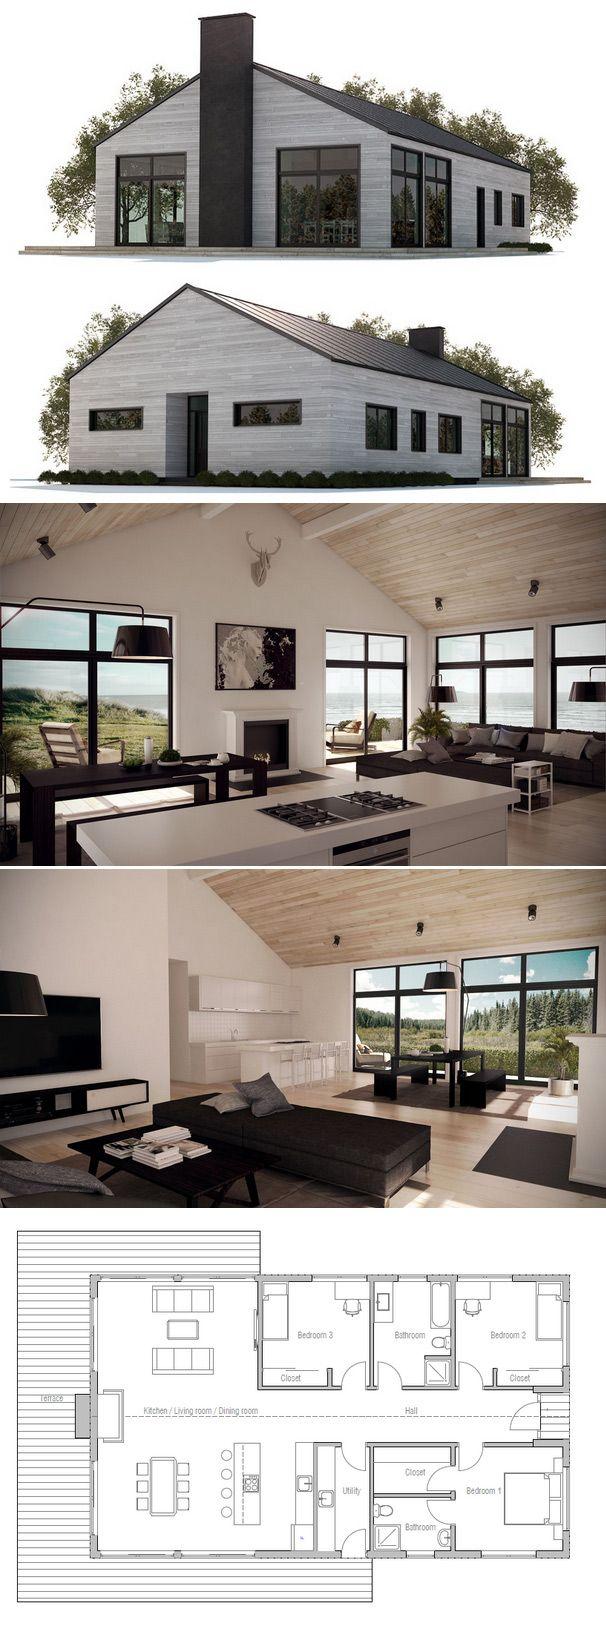 House Plans u0026 Home Plans House